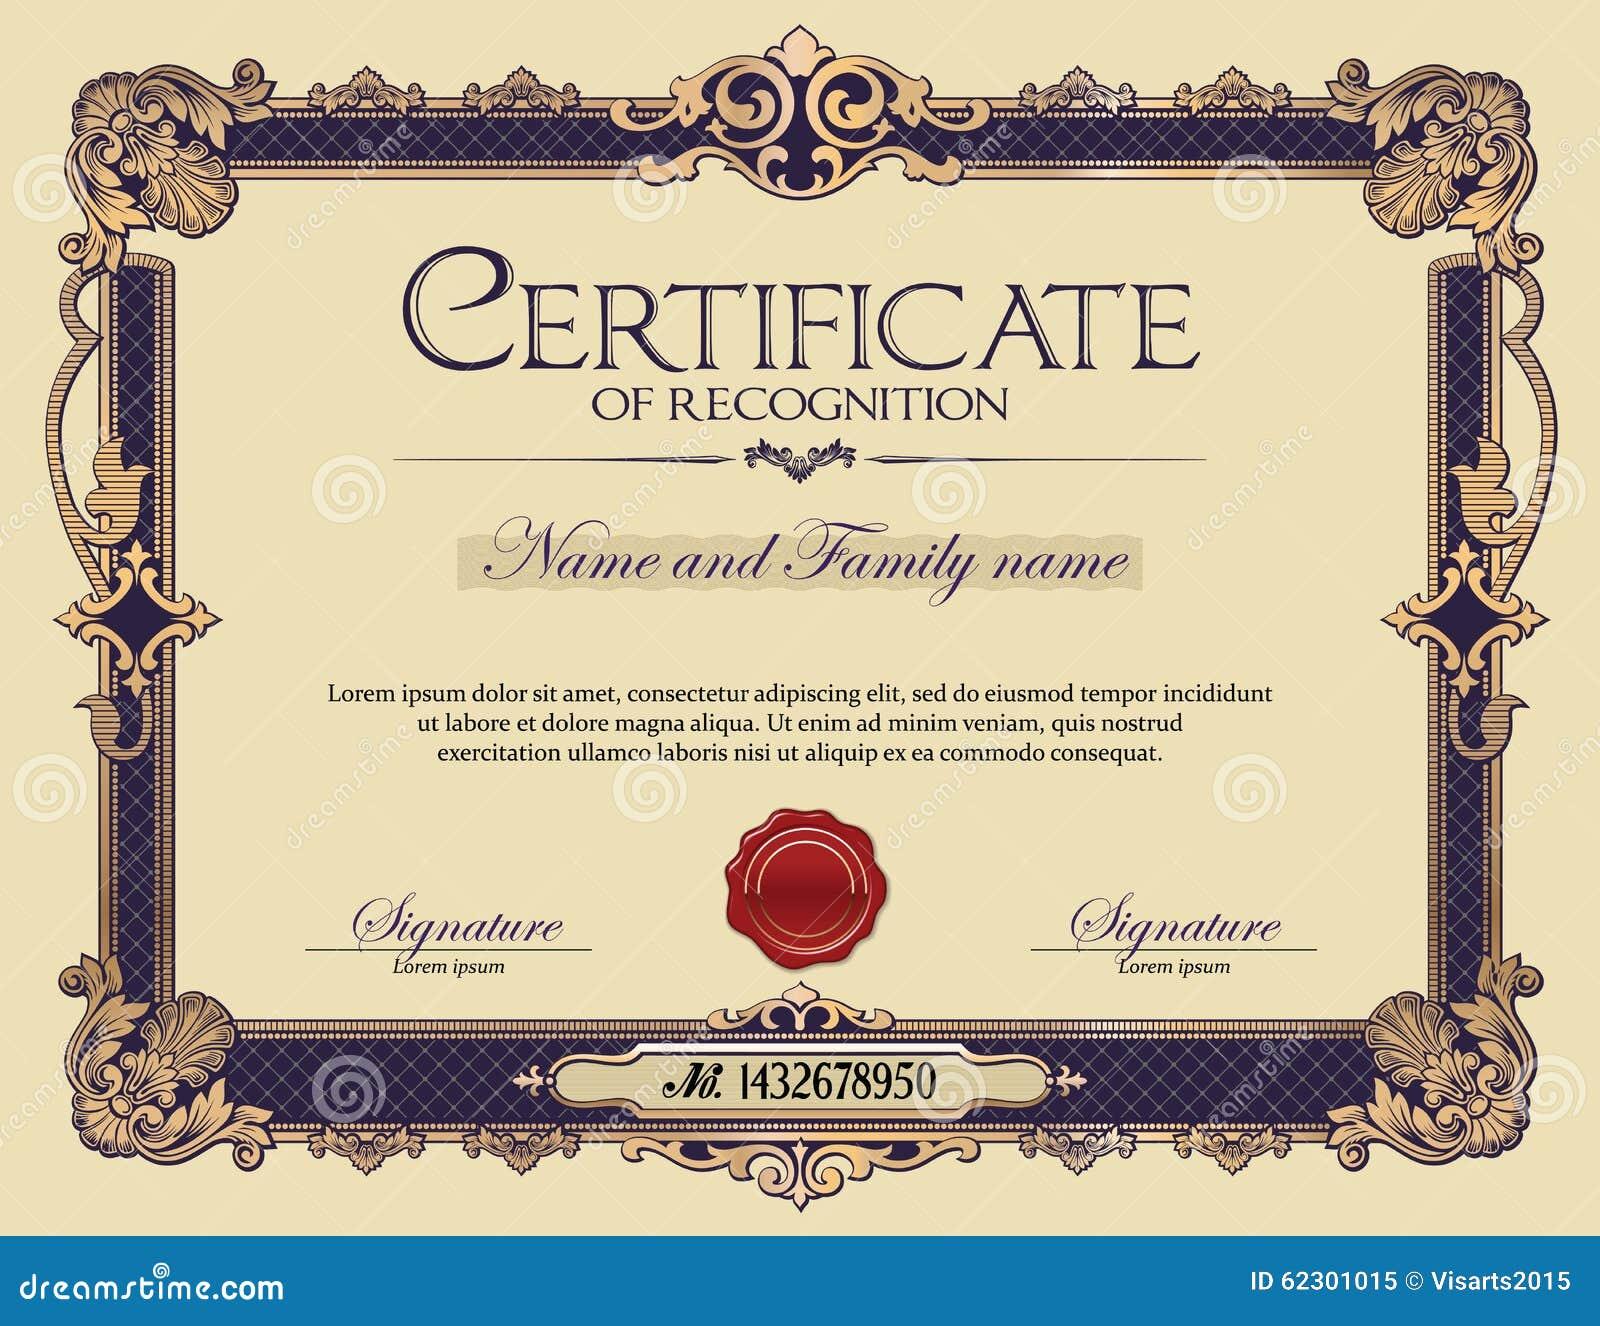 Certificate Of Honor Wording